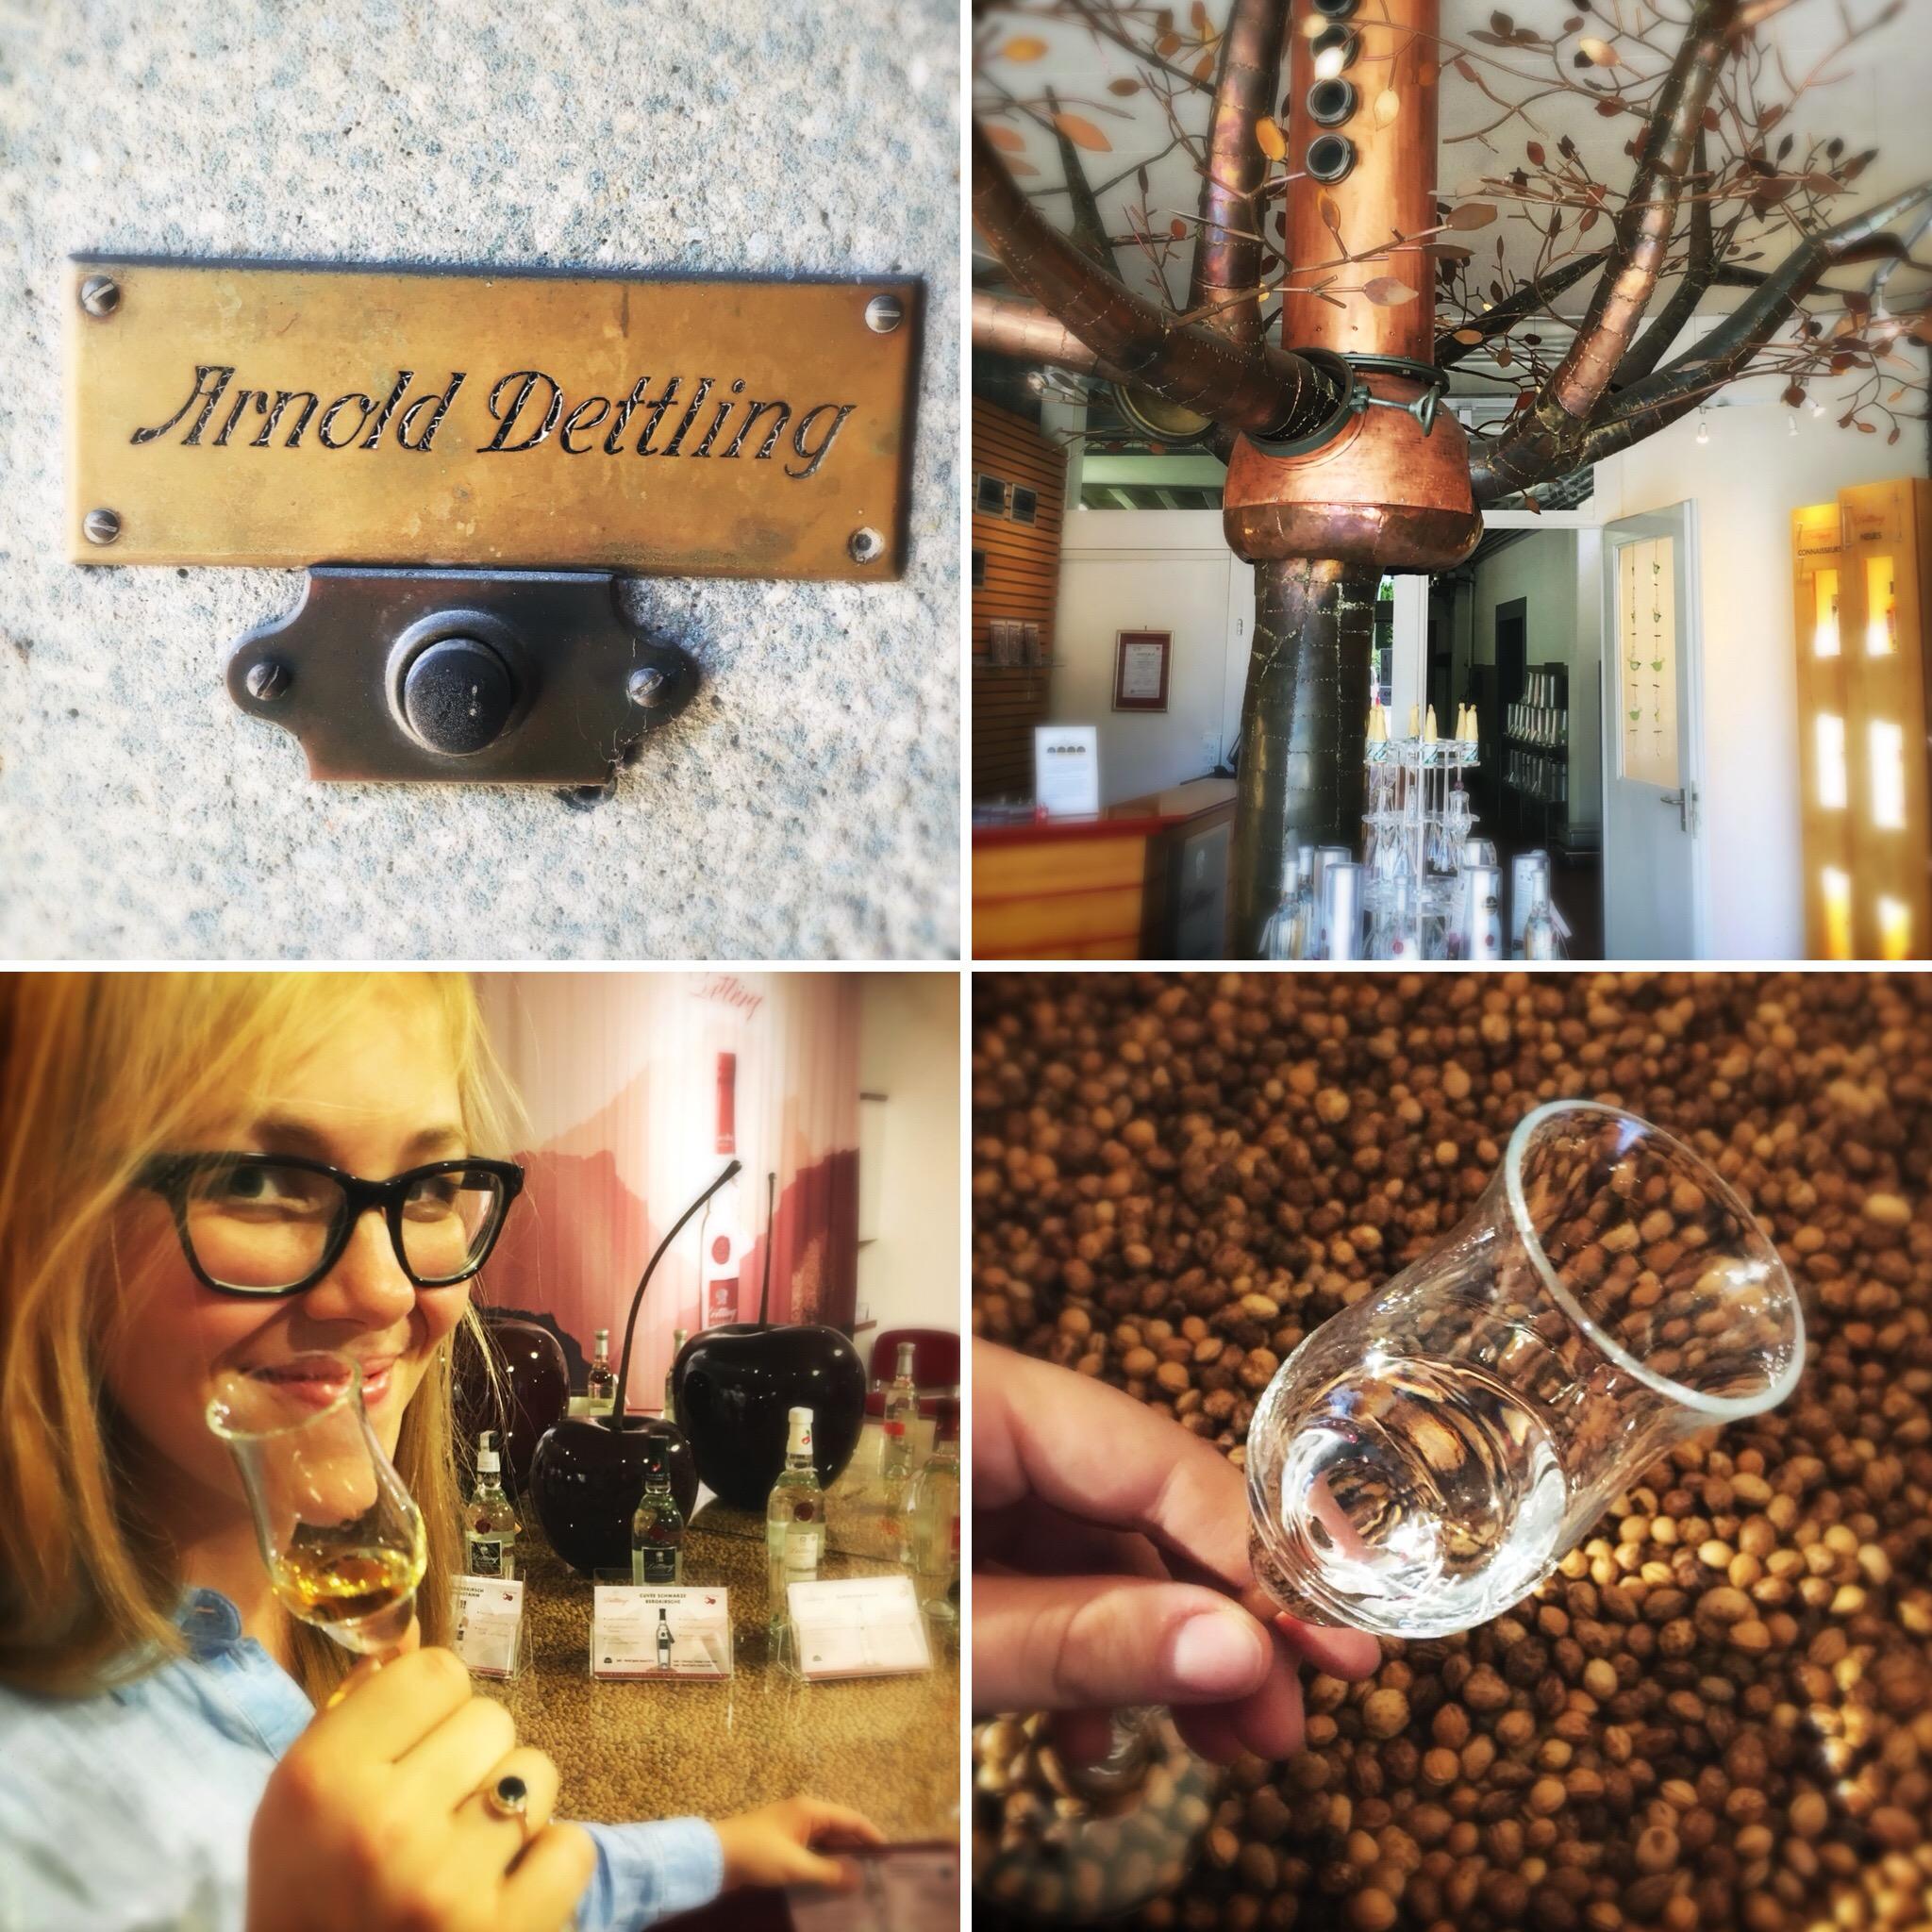 My visit to Dettling, a kirsch distillery -